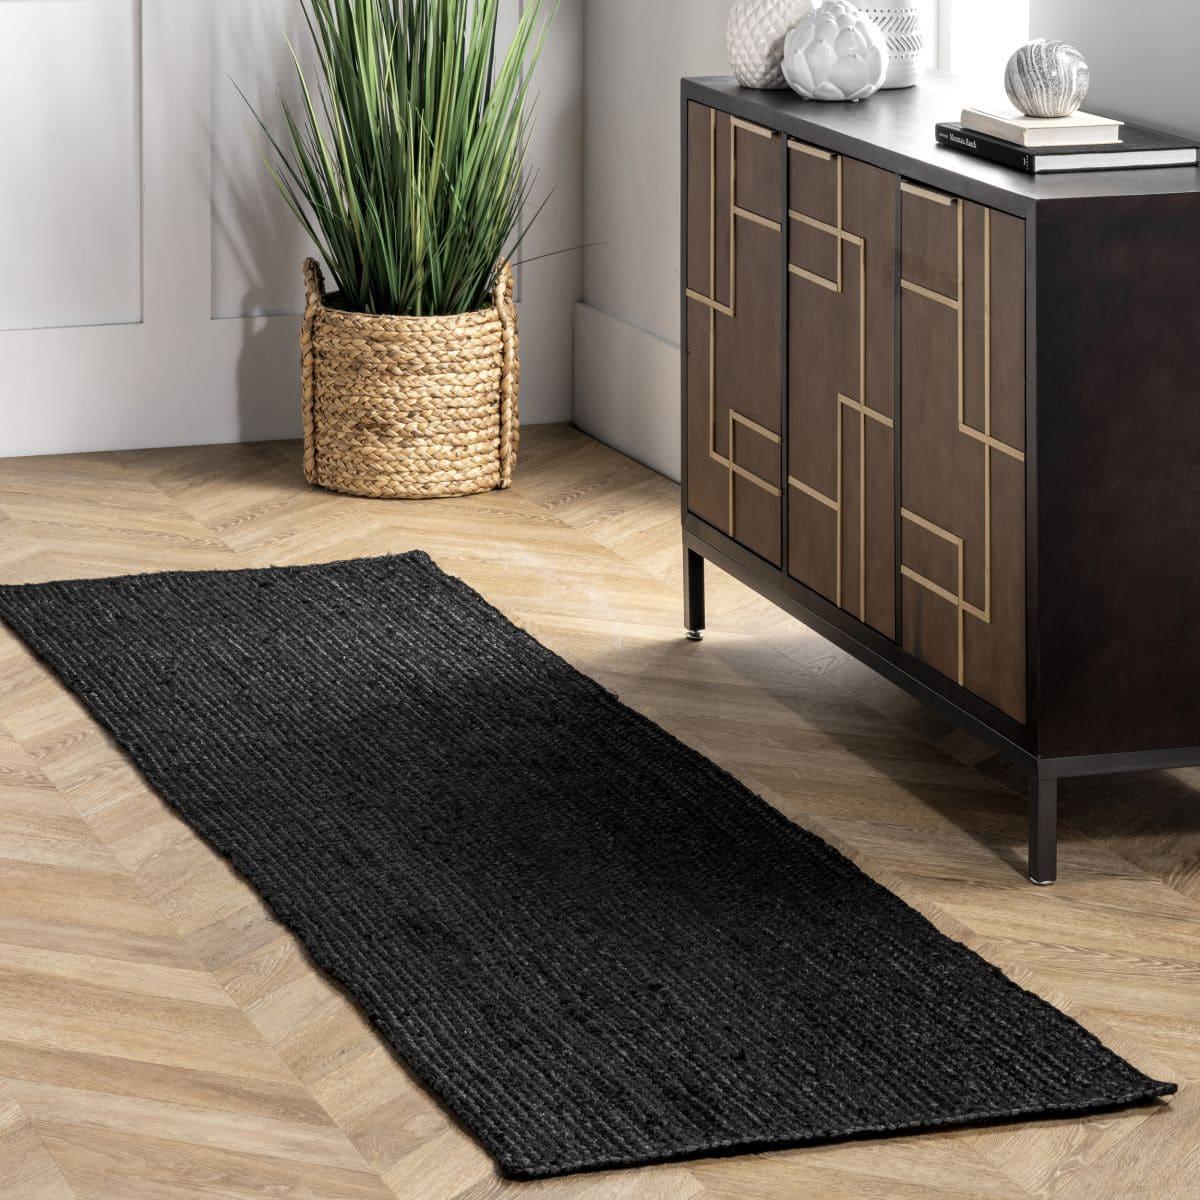 Create Contrast on Light Floors With a Black Rug